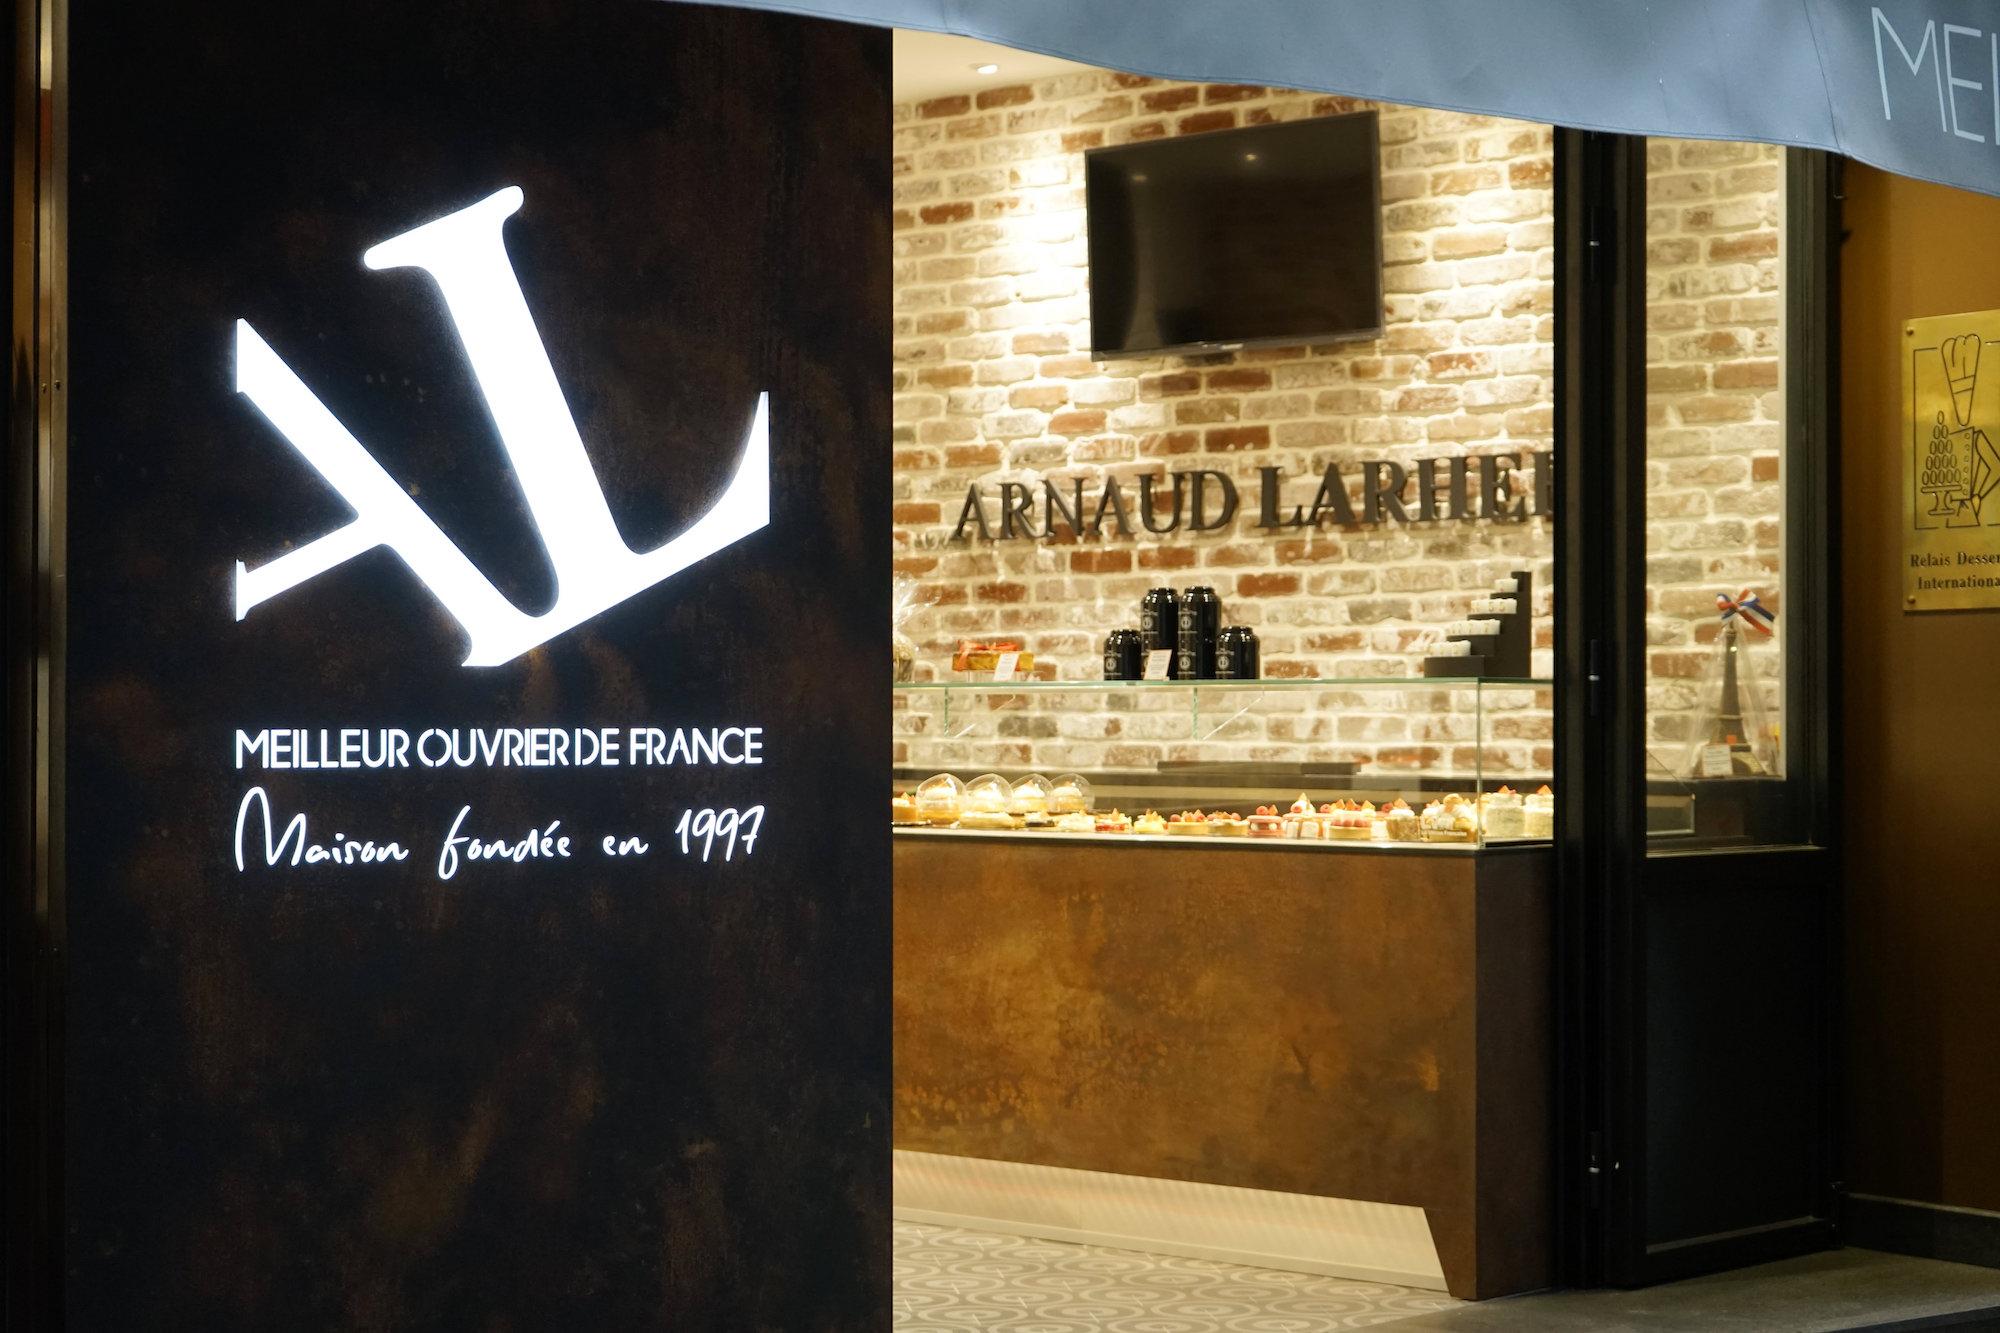 Arnaud Larher(アルノー・ラエール )外観